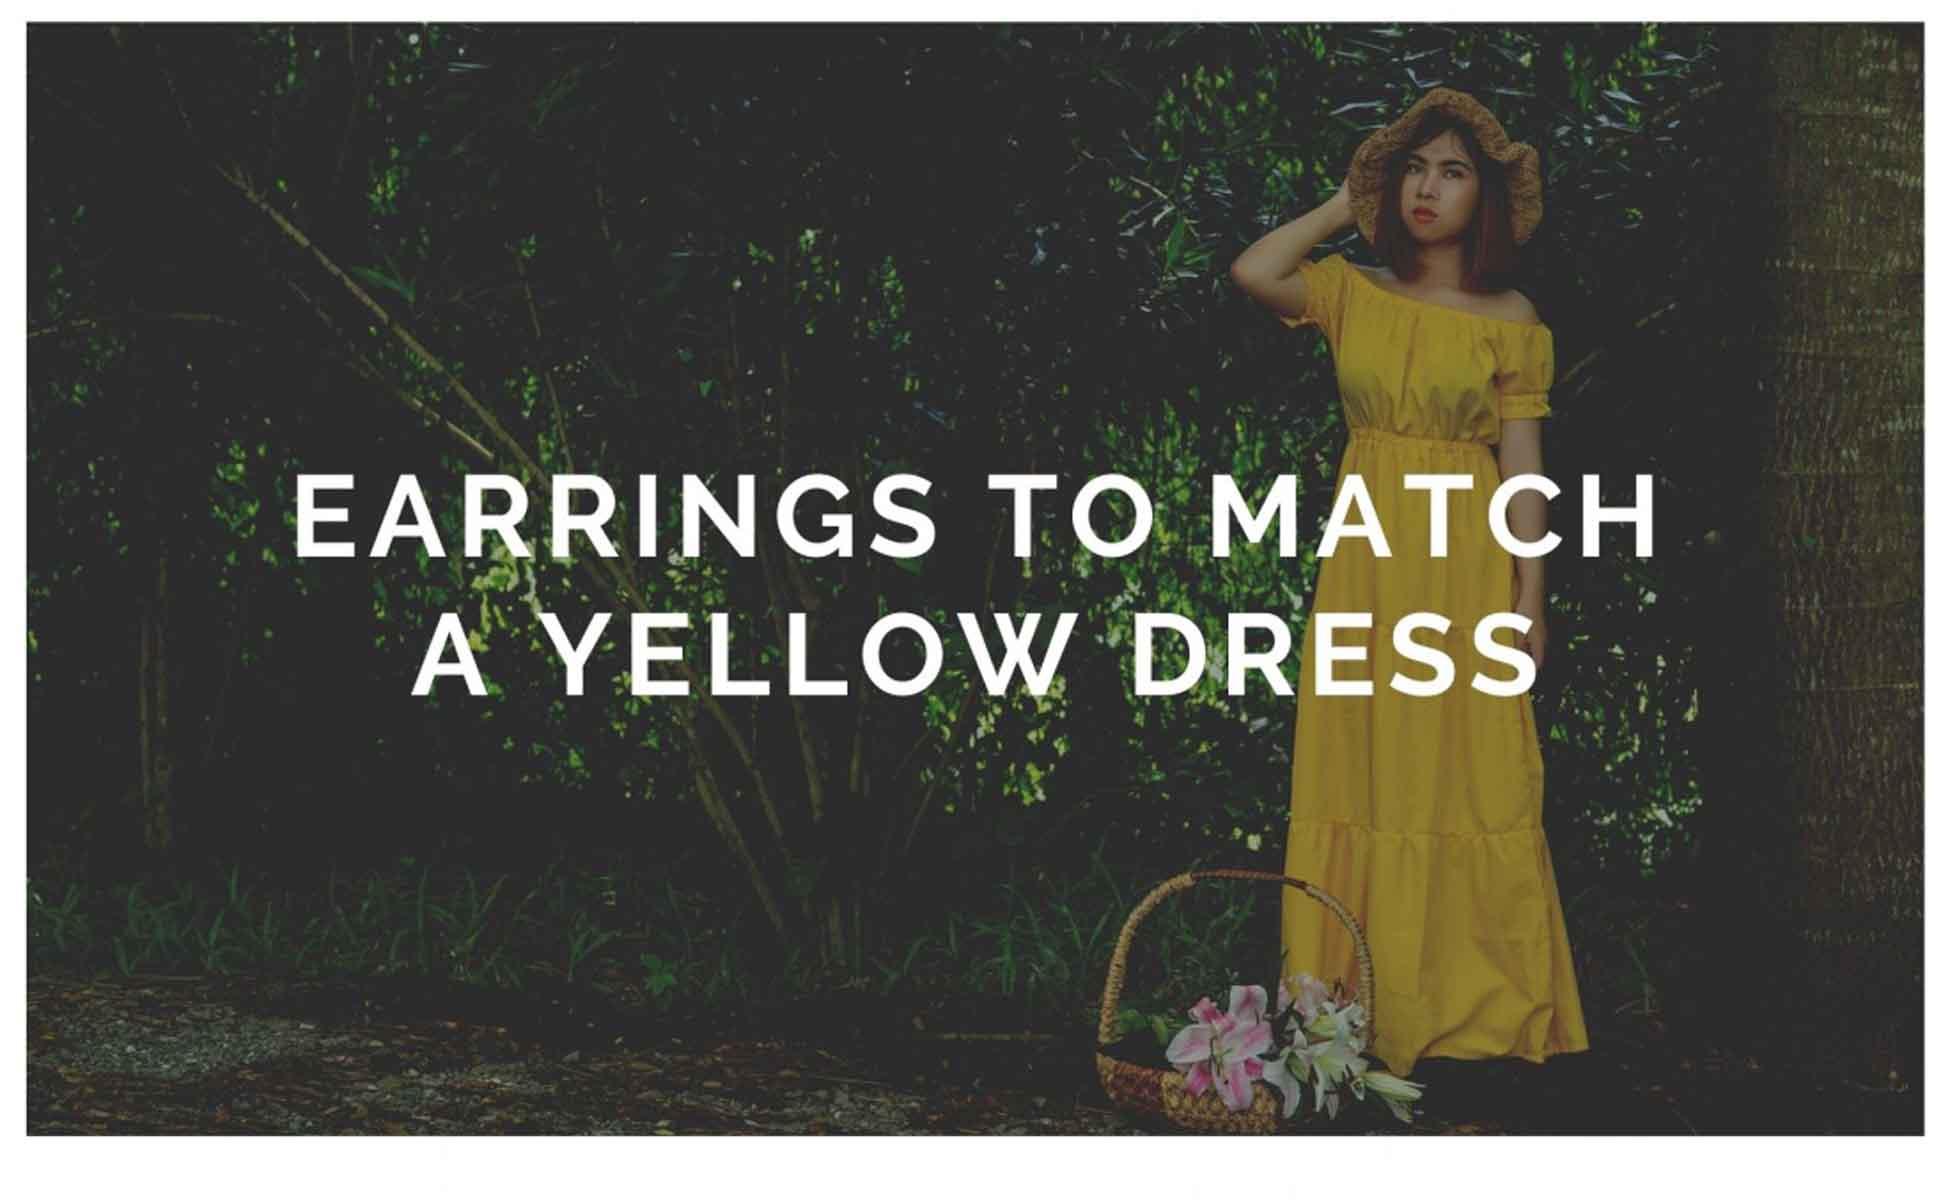 Earrings for a Yellow Dress